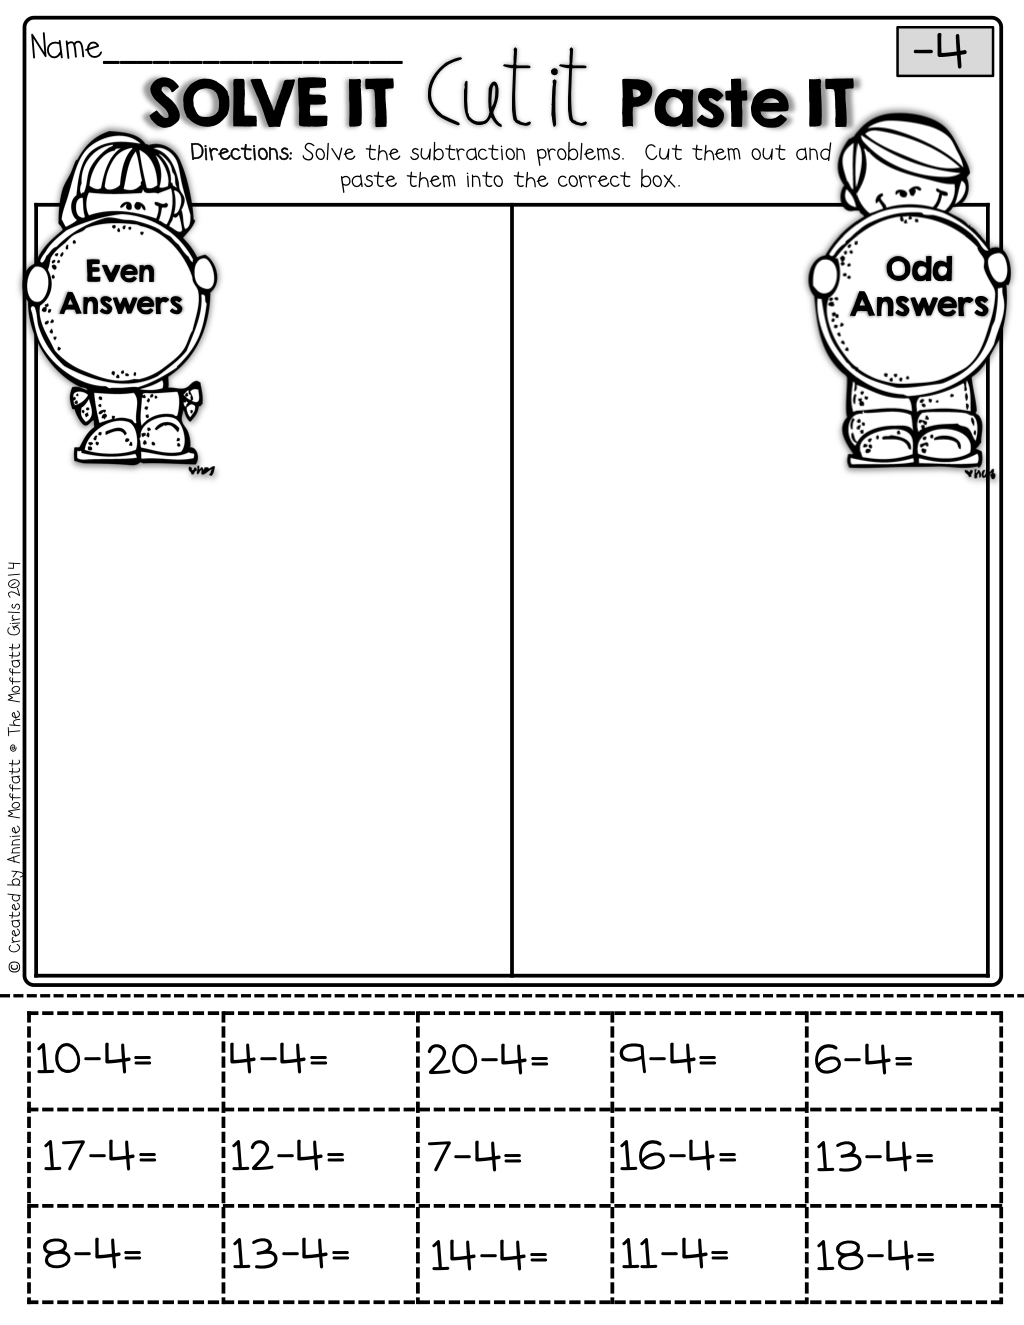 hight resolution of The Moffatt Girls: Interactive Math Packet (Subtraction up to 20)   Math  packets